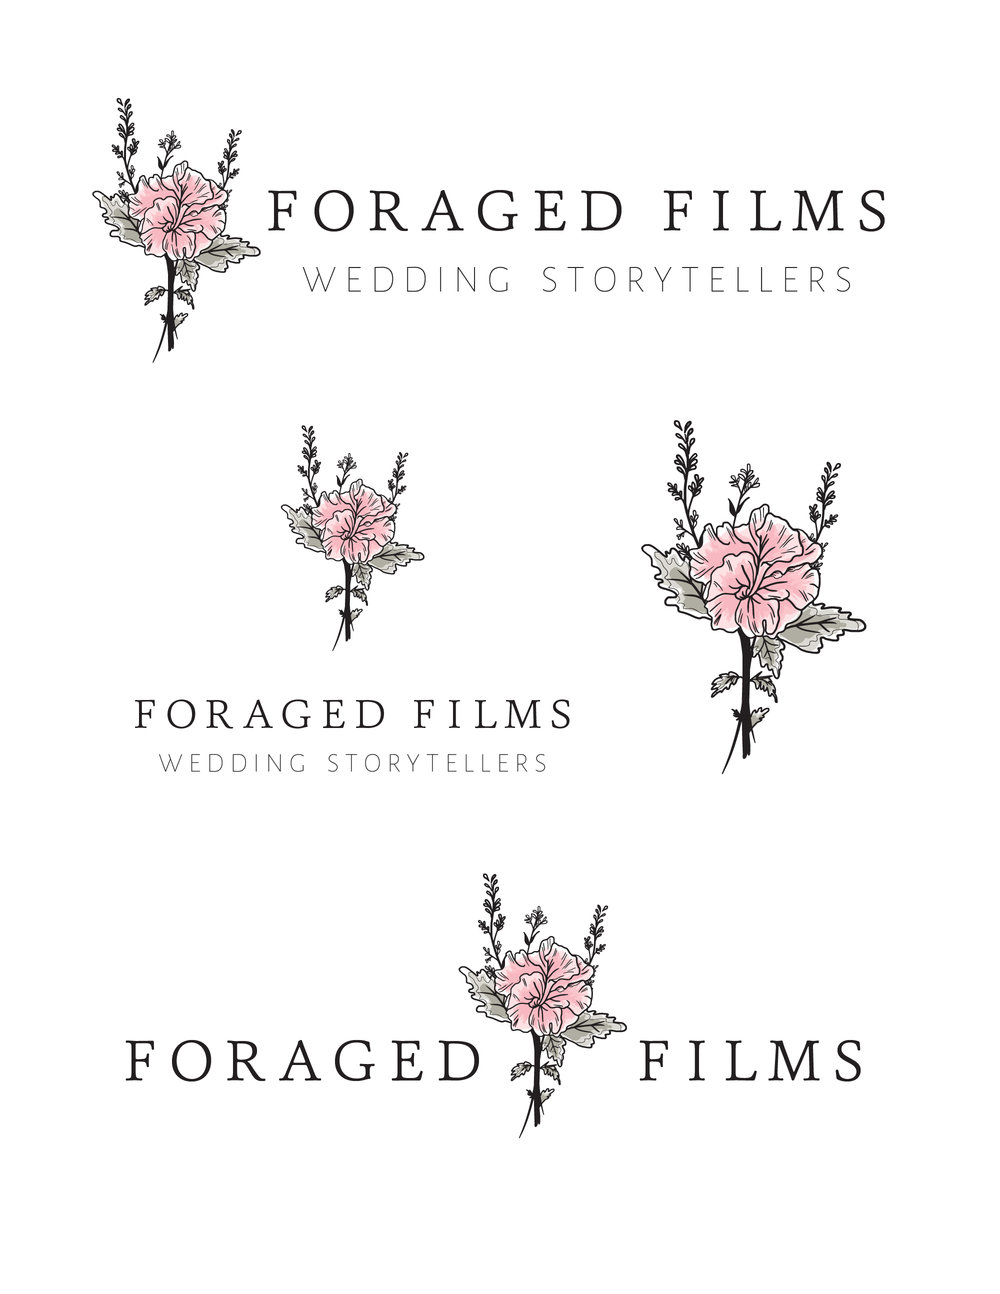 foragedfilms_logos_color.jpg